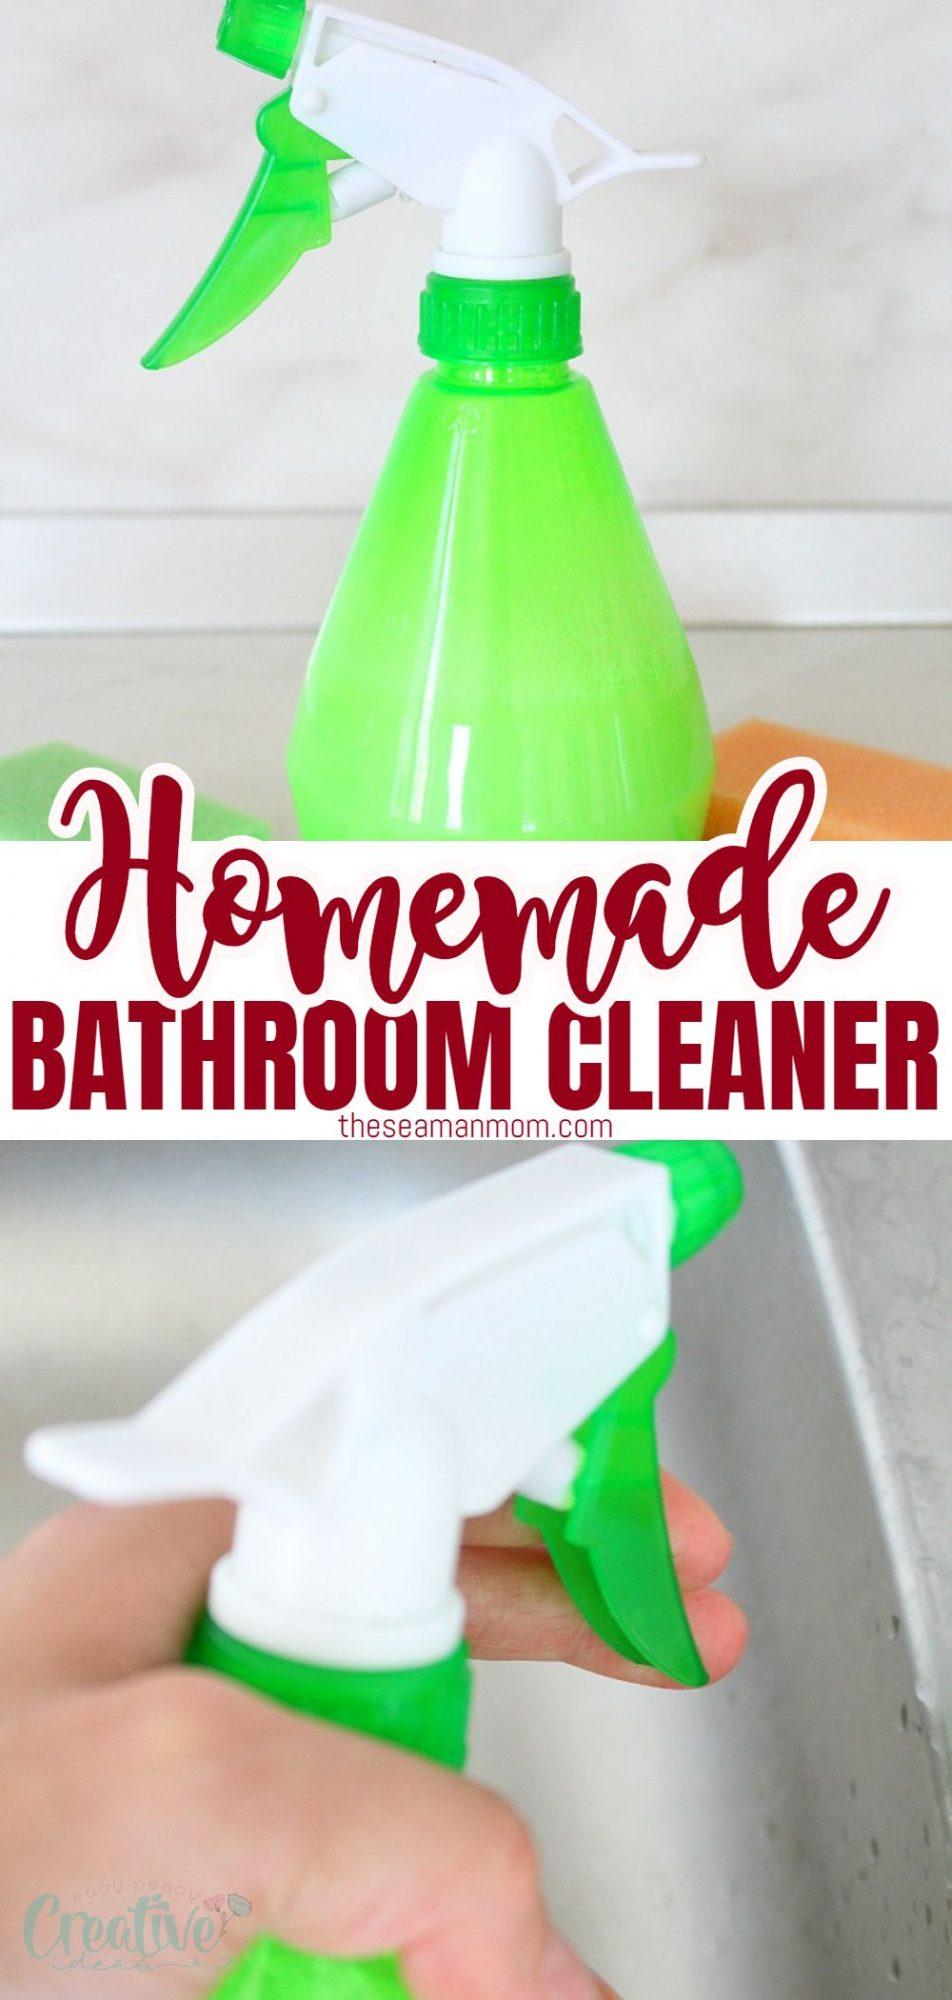 Homemade bathroom cleaner in a green spray bottle